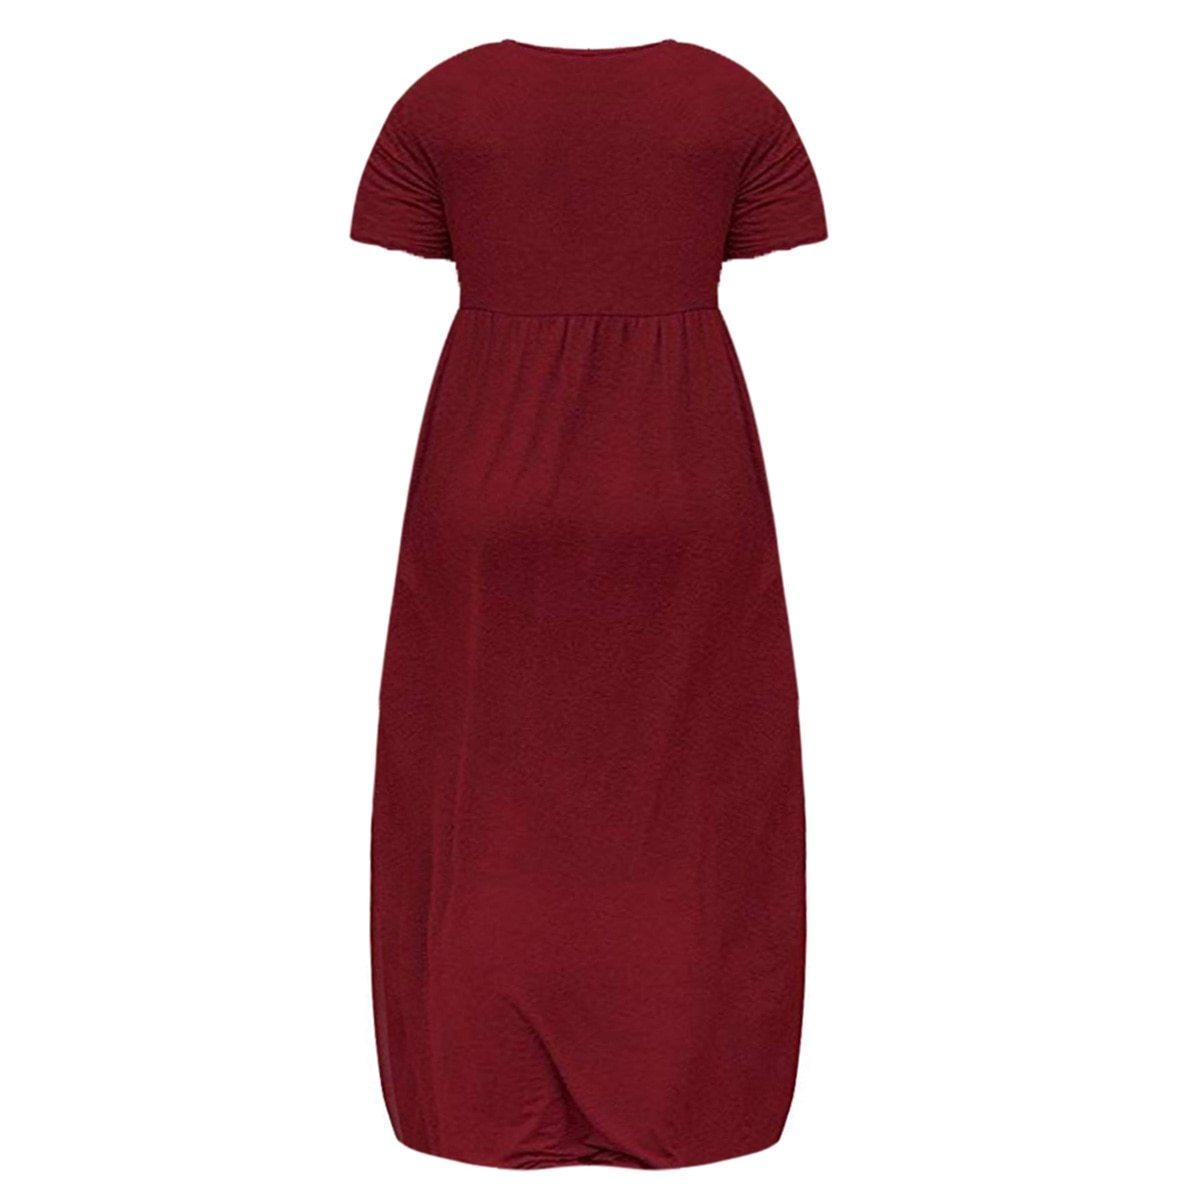 Maternity Dress Solid Color Loose Comfy Mom Dress image 4